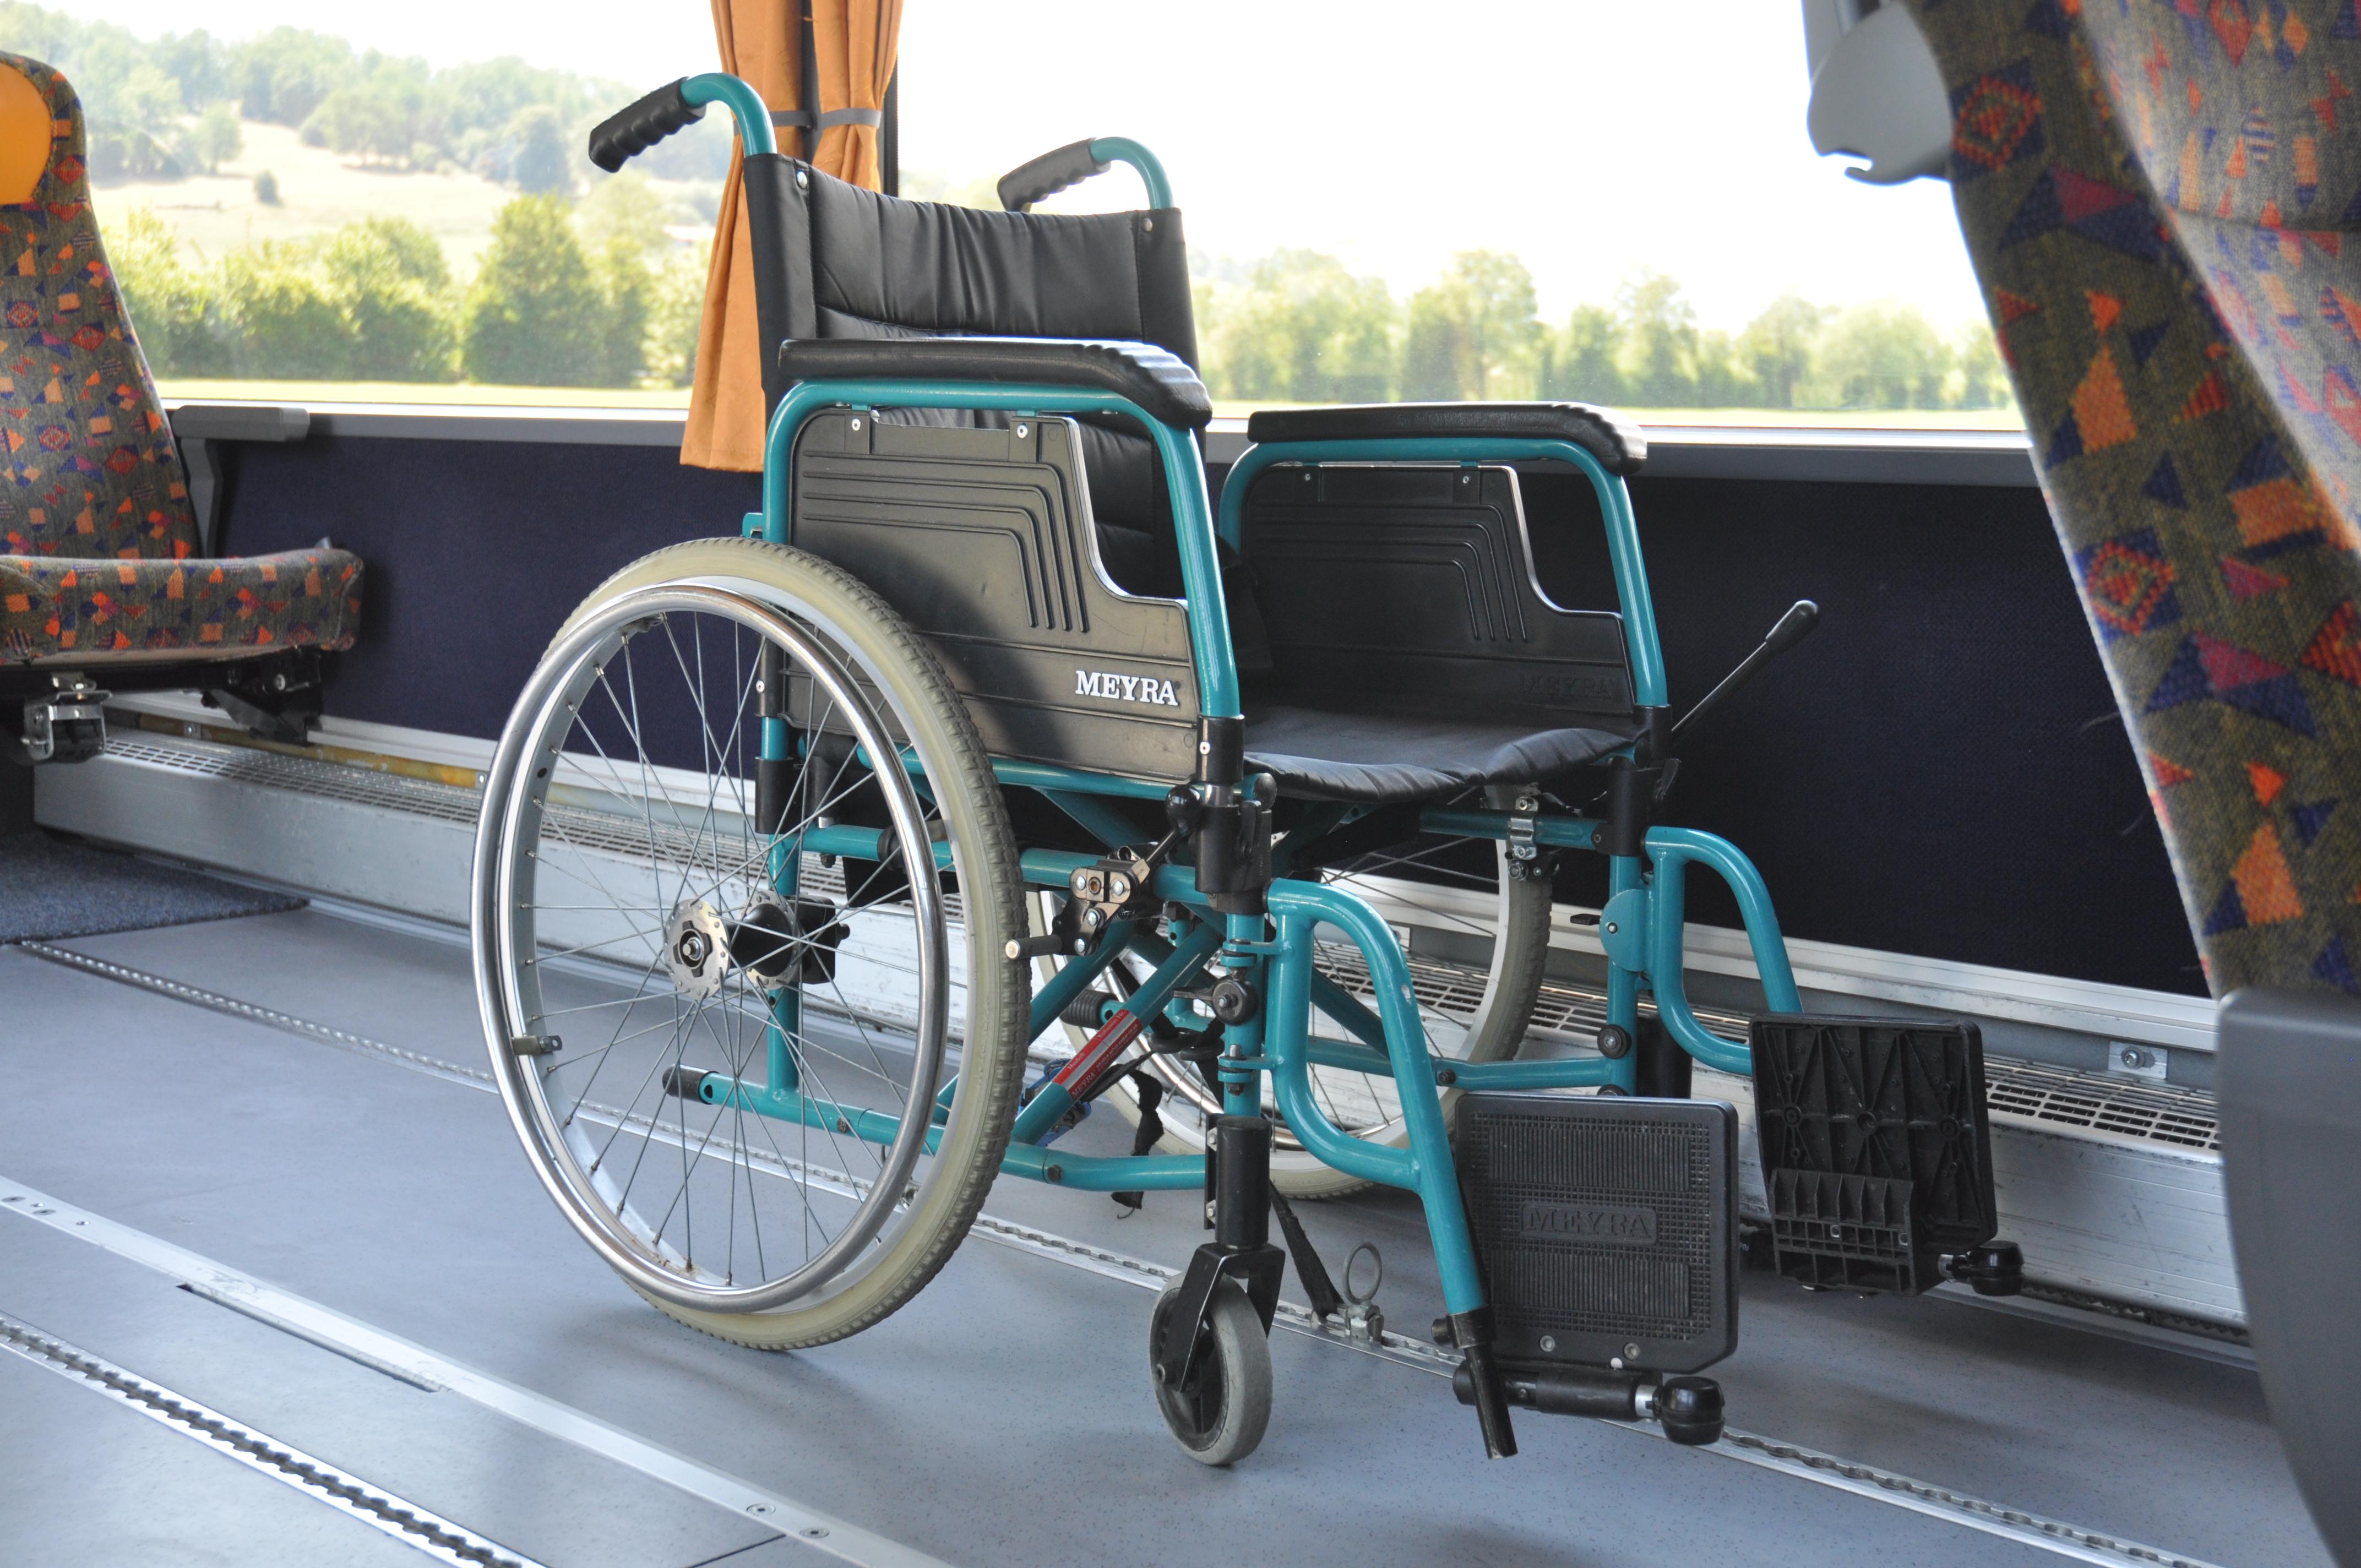 Rollstuhlinnengesichert